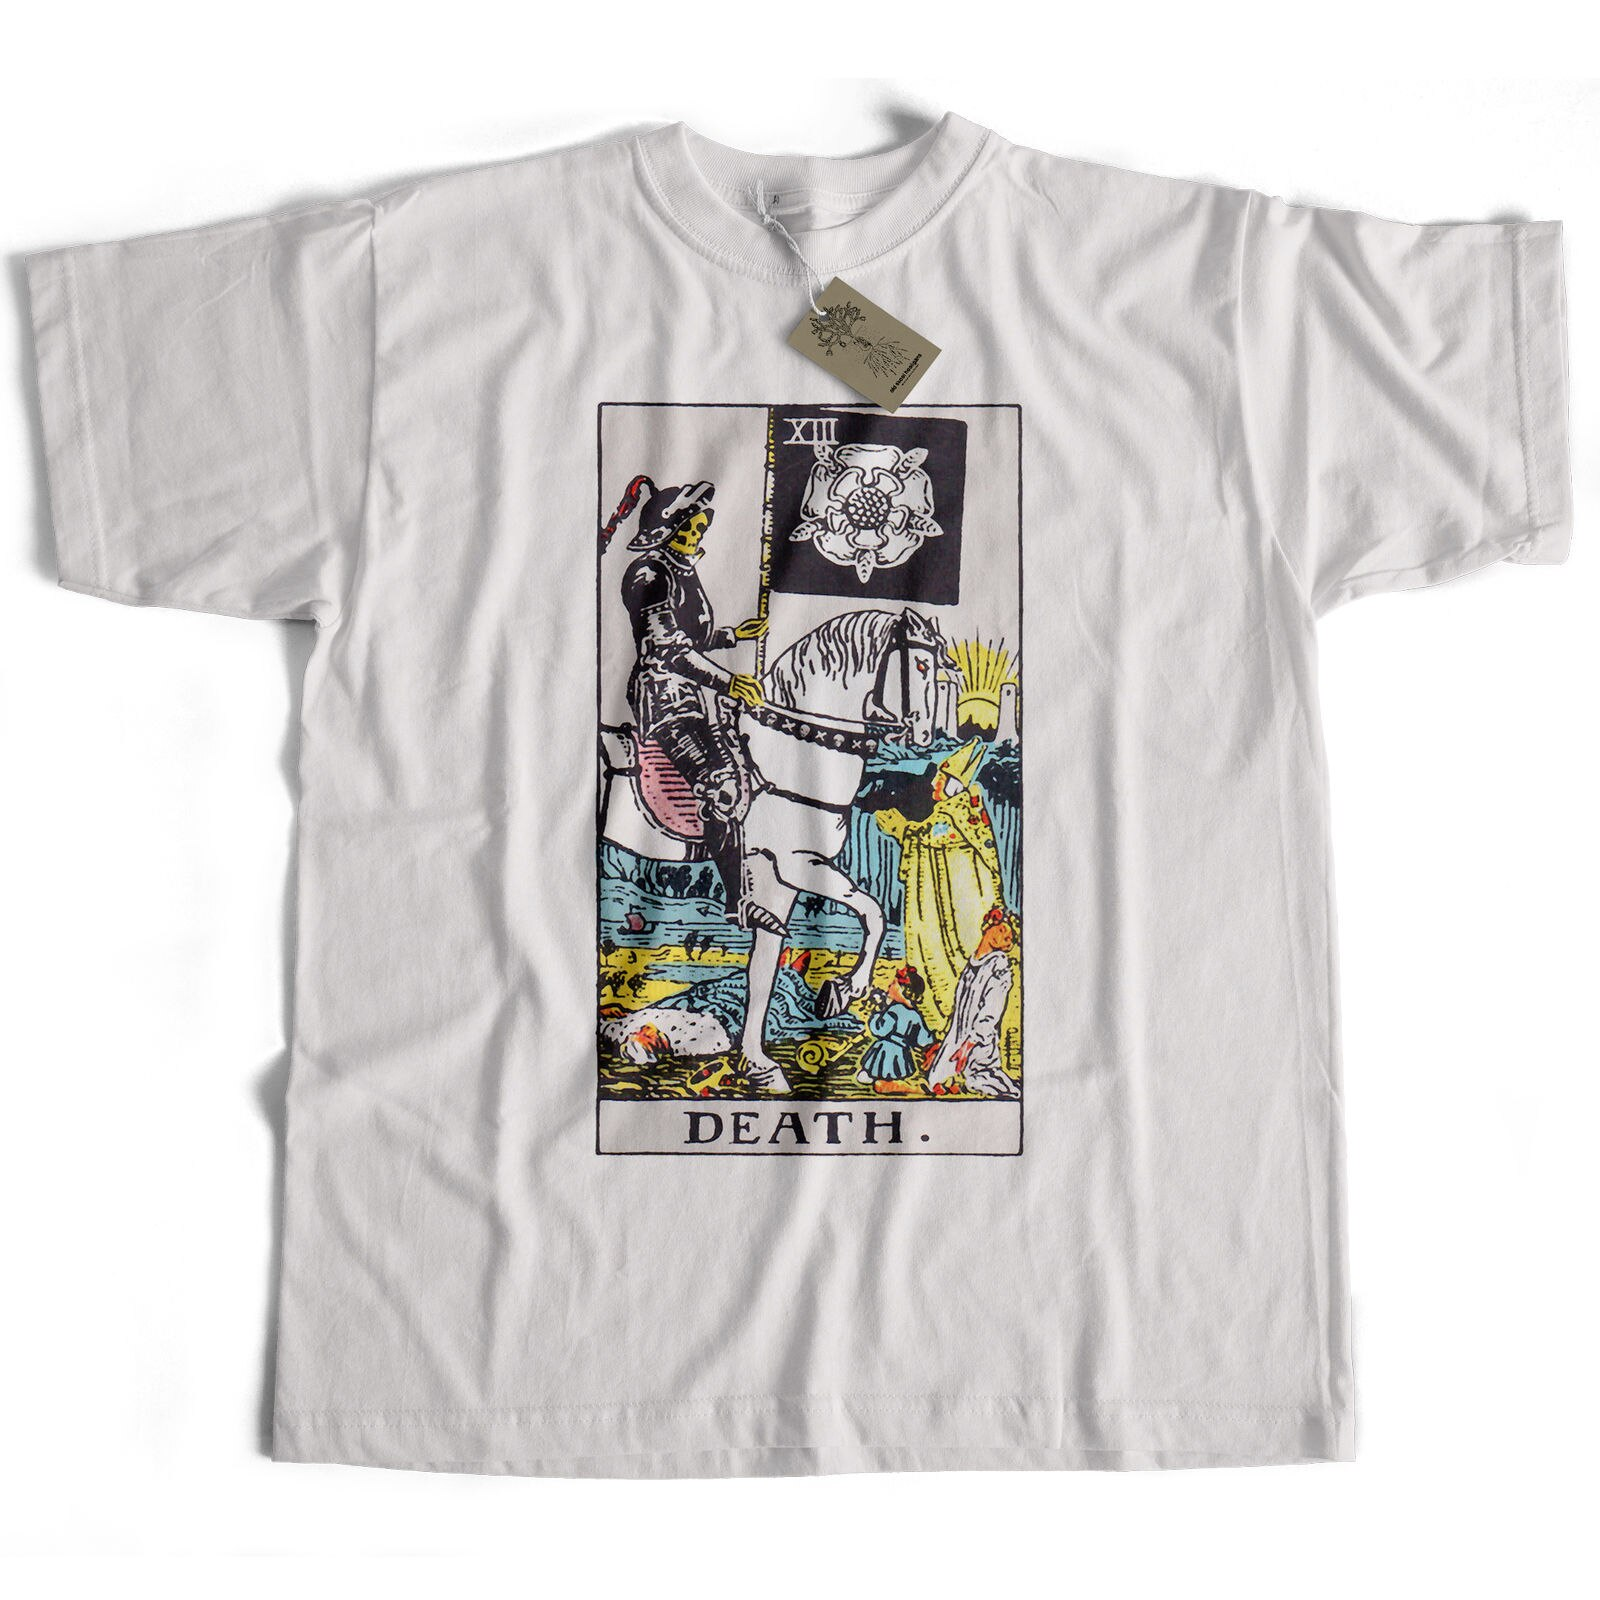 Viejo Skool Hooligans jinete Waite Tarot T camisa-color de la muerte tarjeta oculta magia